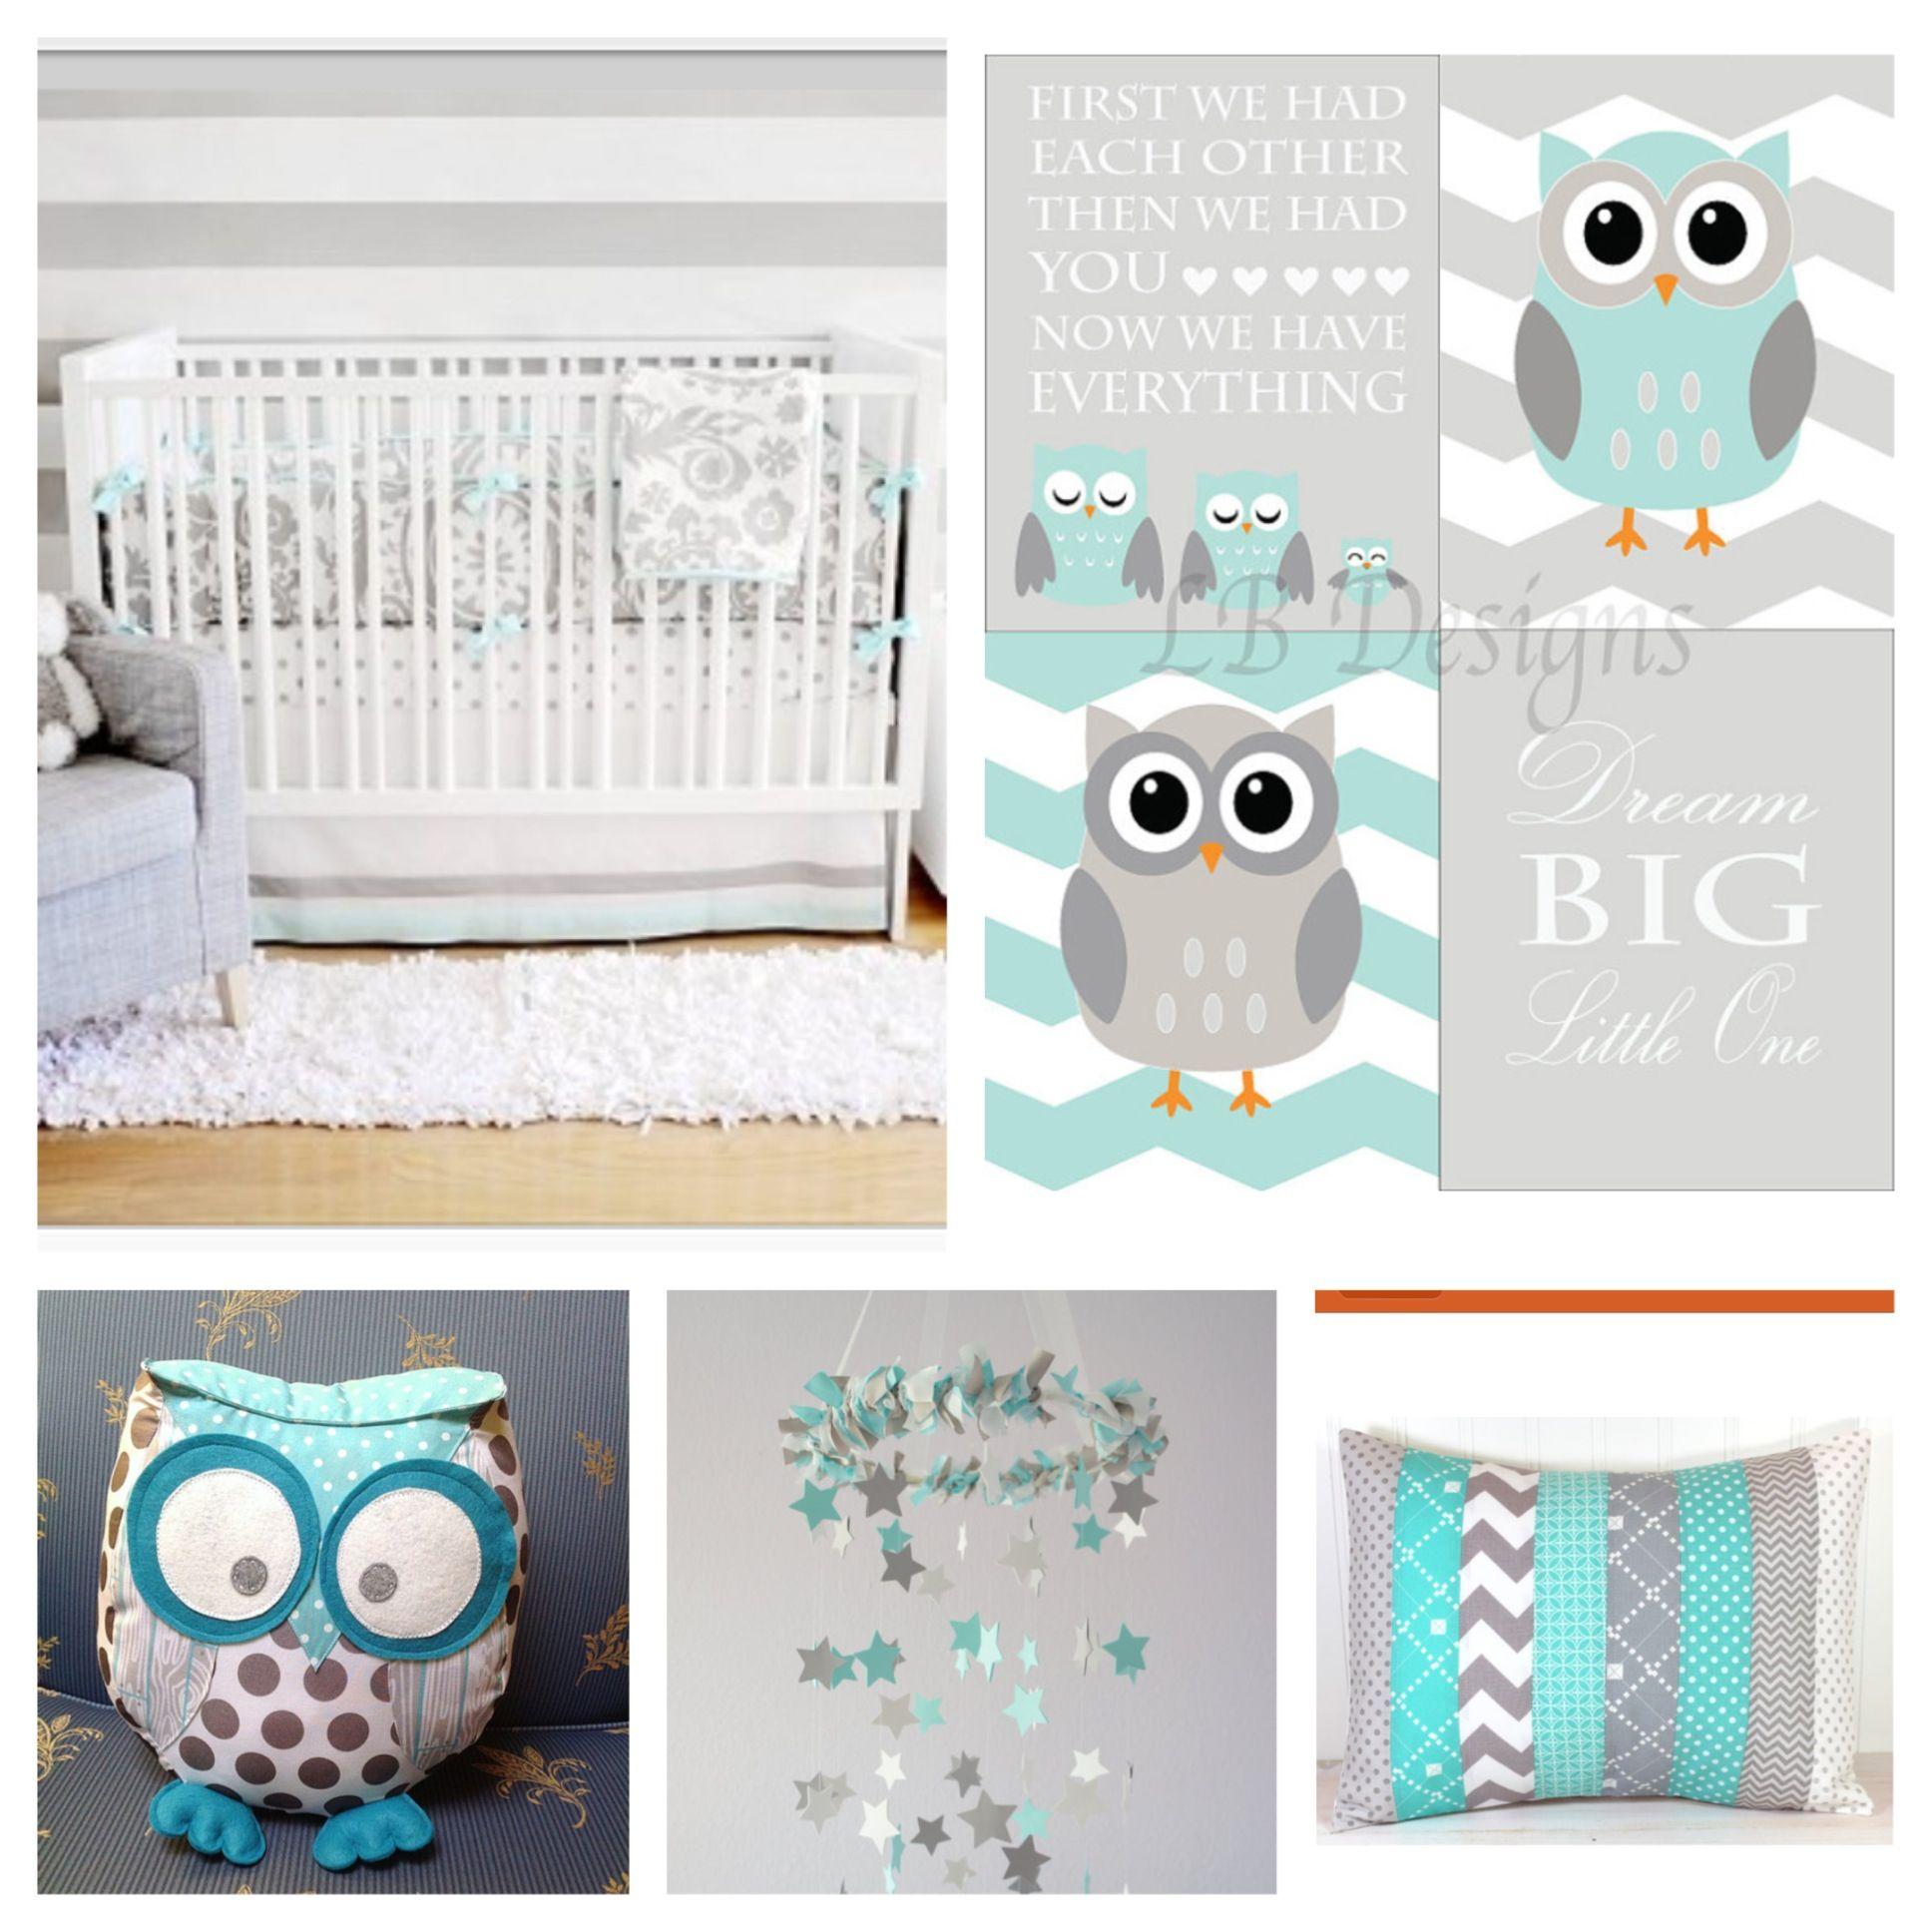 Pin By Robin Cundiff On Gender Neutral Nursery Baby Girl Nursery Room Boy Nursery Themes Owl Nursery